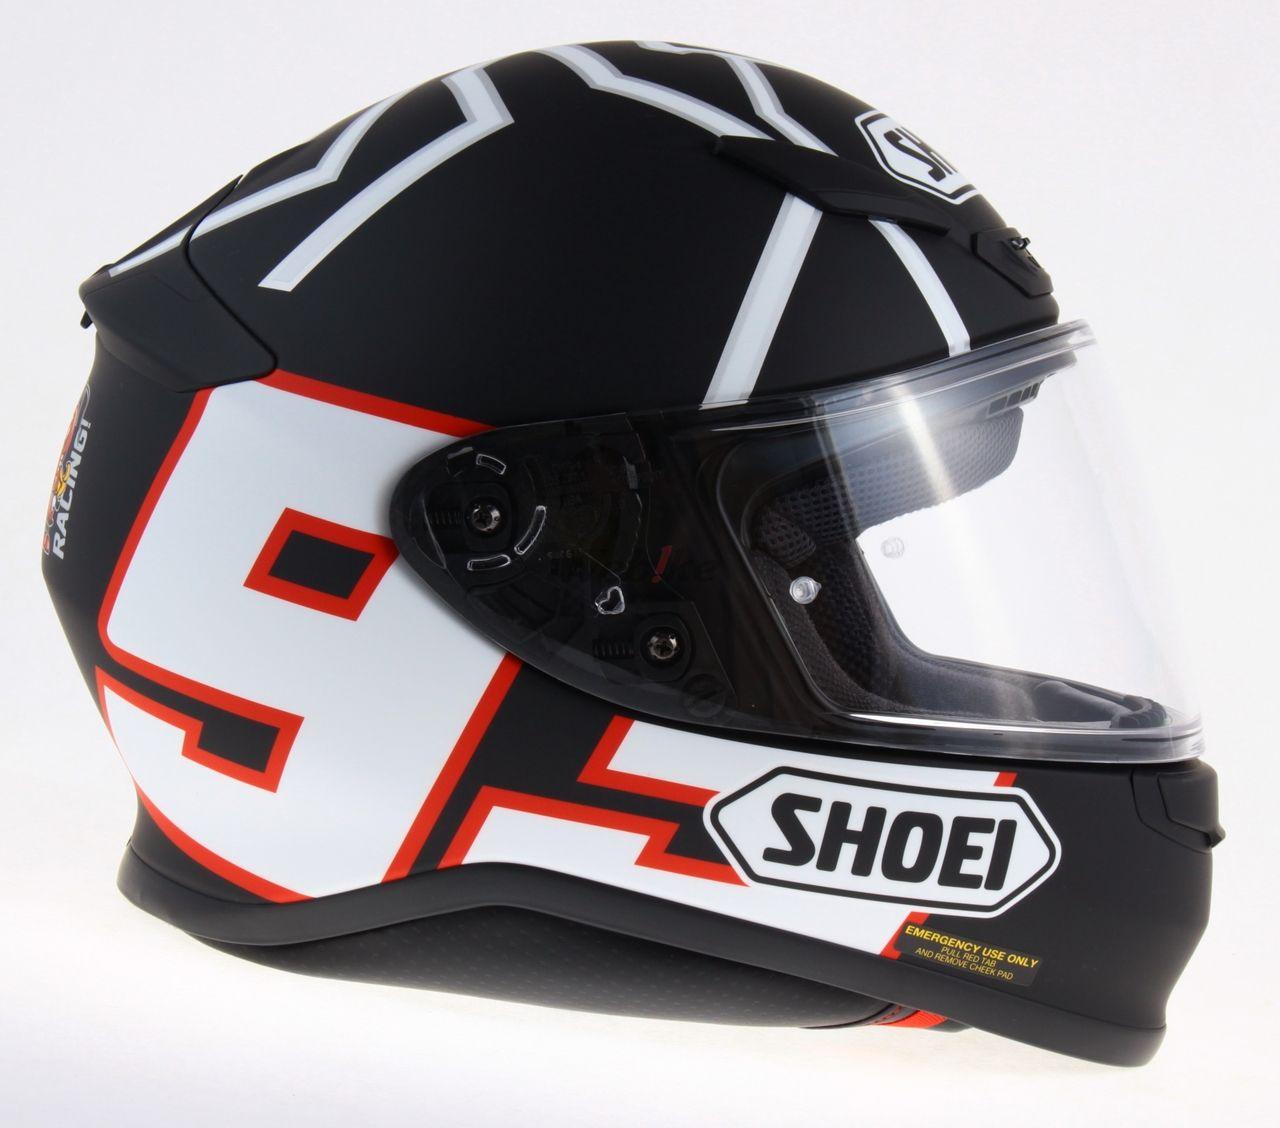 【SHOEI】Z-7 MARQUEZ BLACK ANT 全罩式安全帽 - 「Webike-摩托百貨」